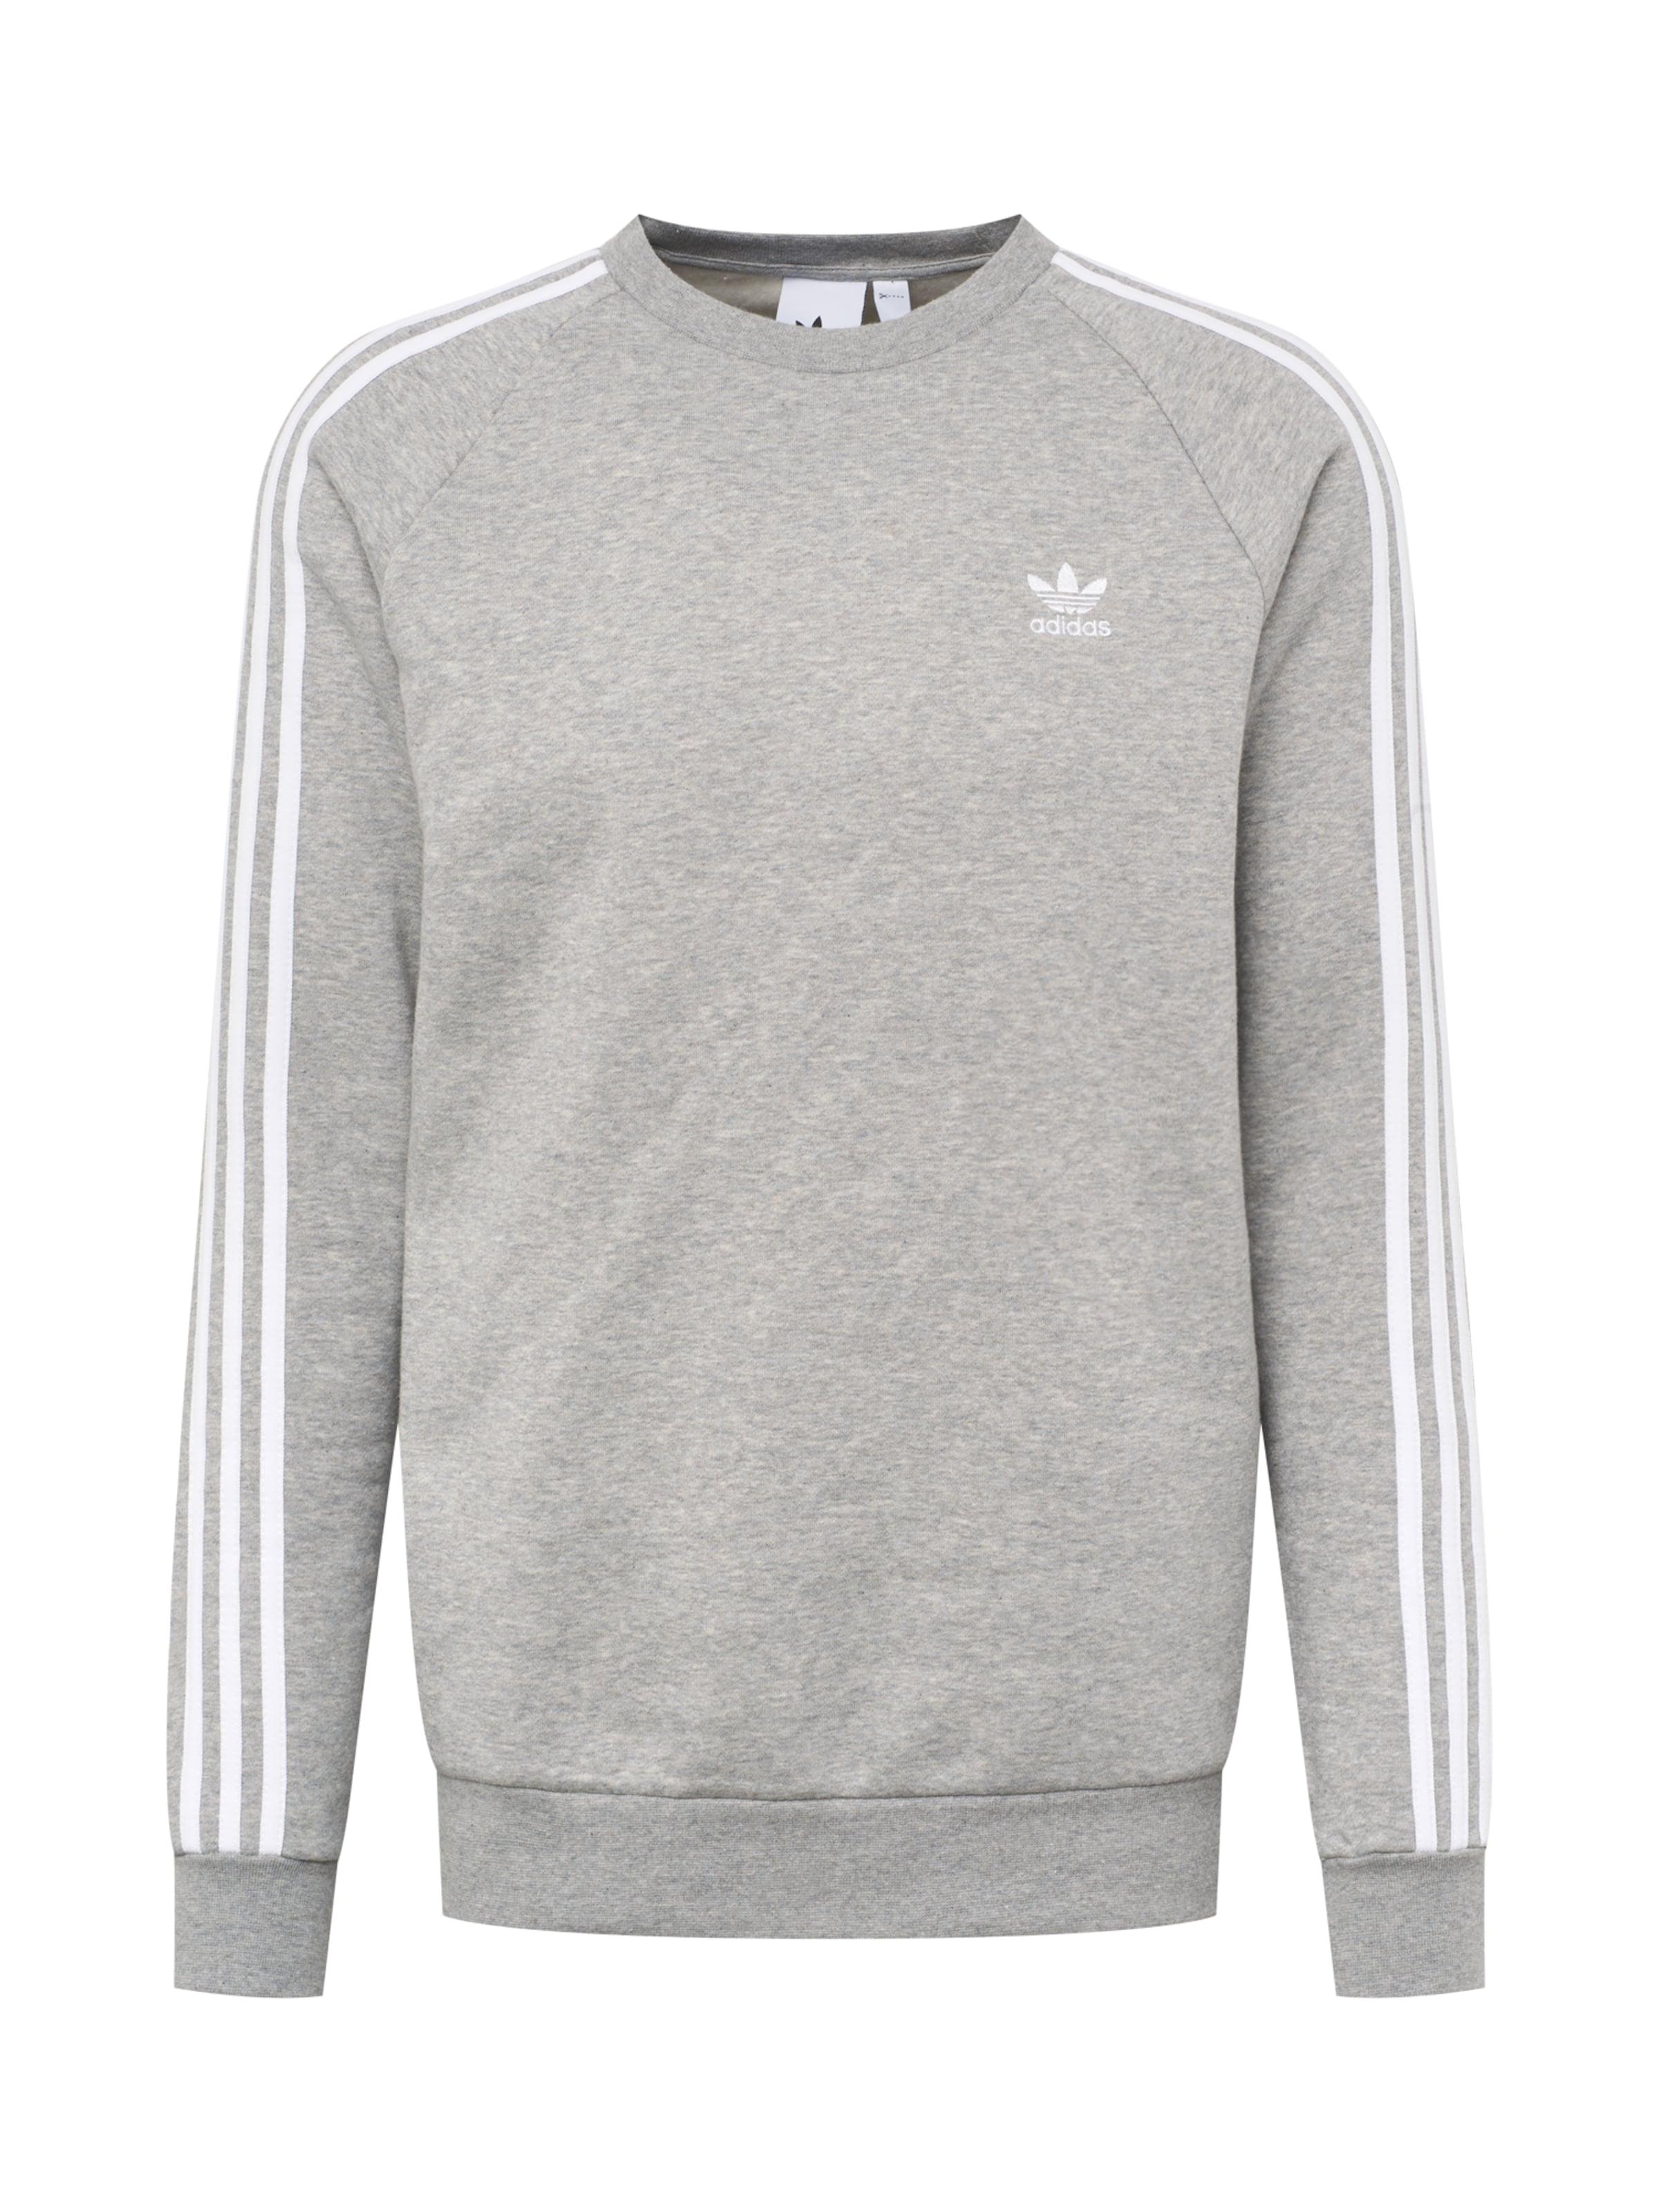 '3 Sweat streifen' Gris shirt En Clair Originals Adidas lFJc31KT